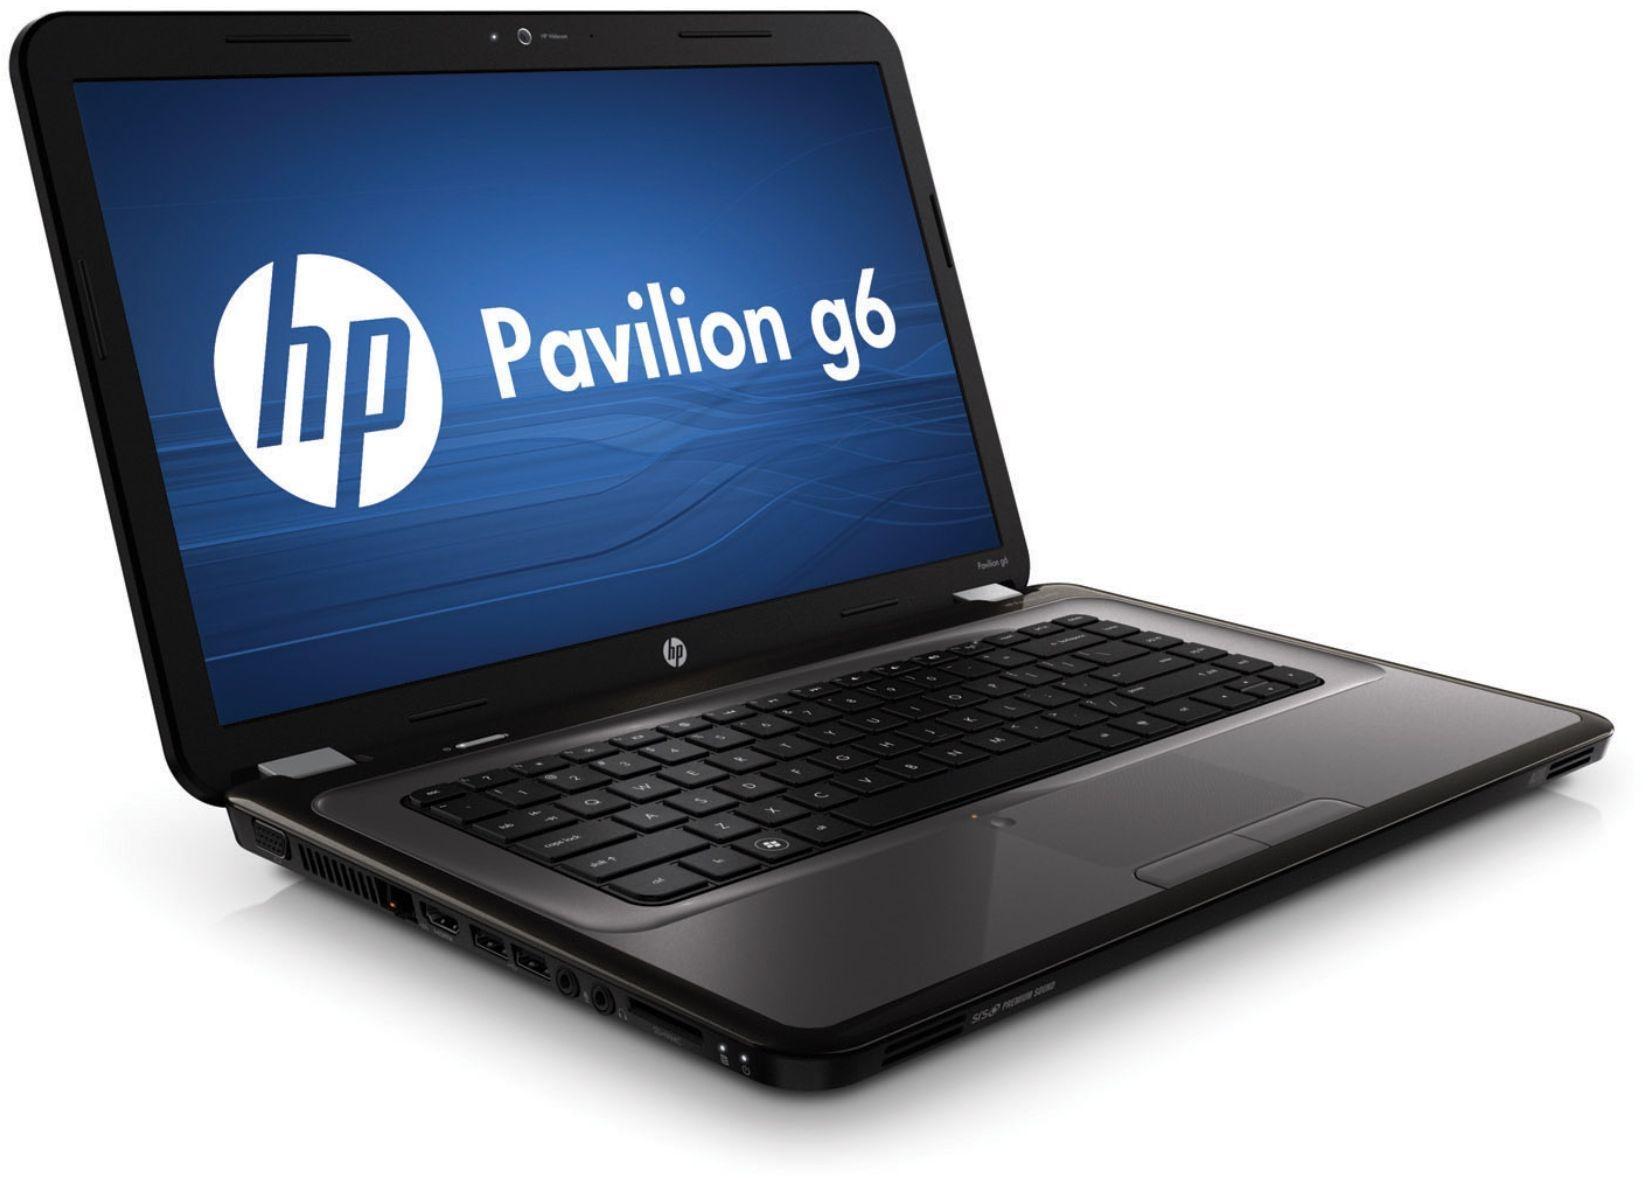 Обзор ноутбука HP Pavilion g6 описание характеристики